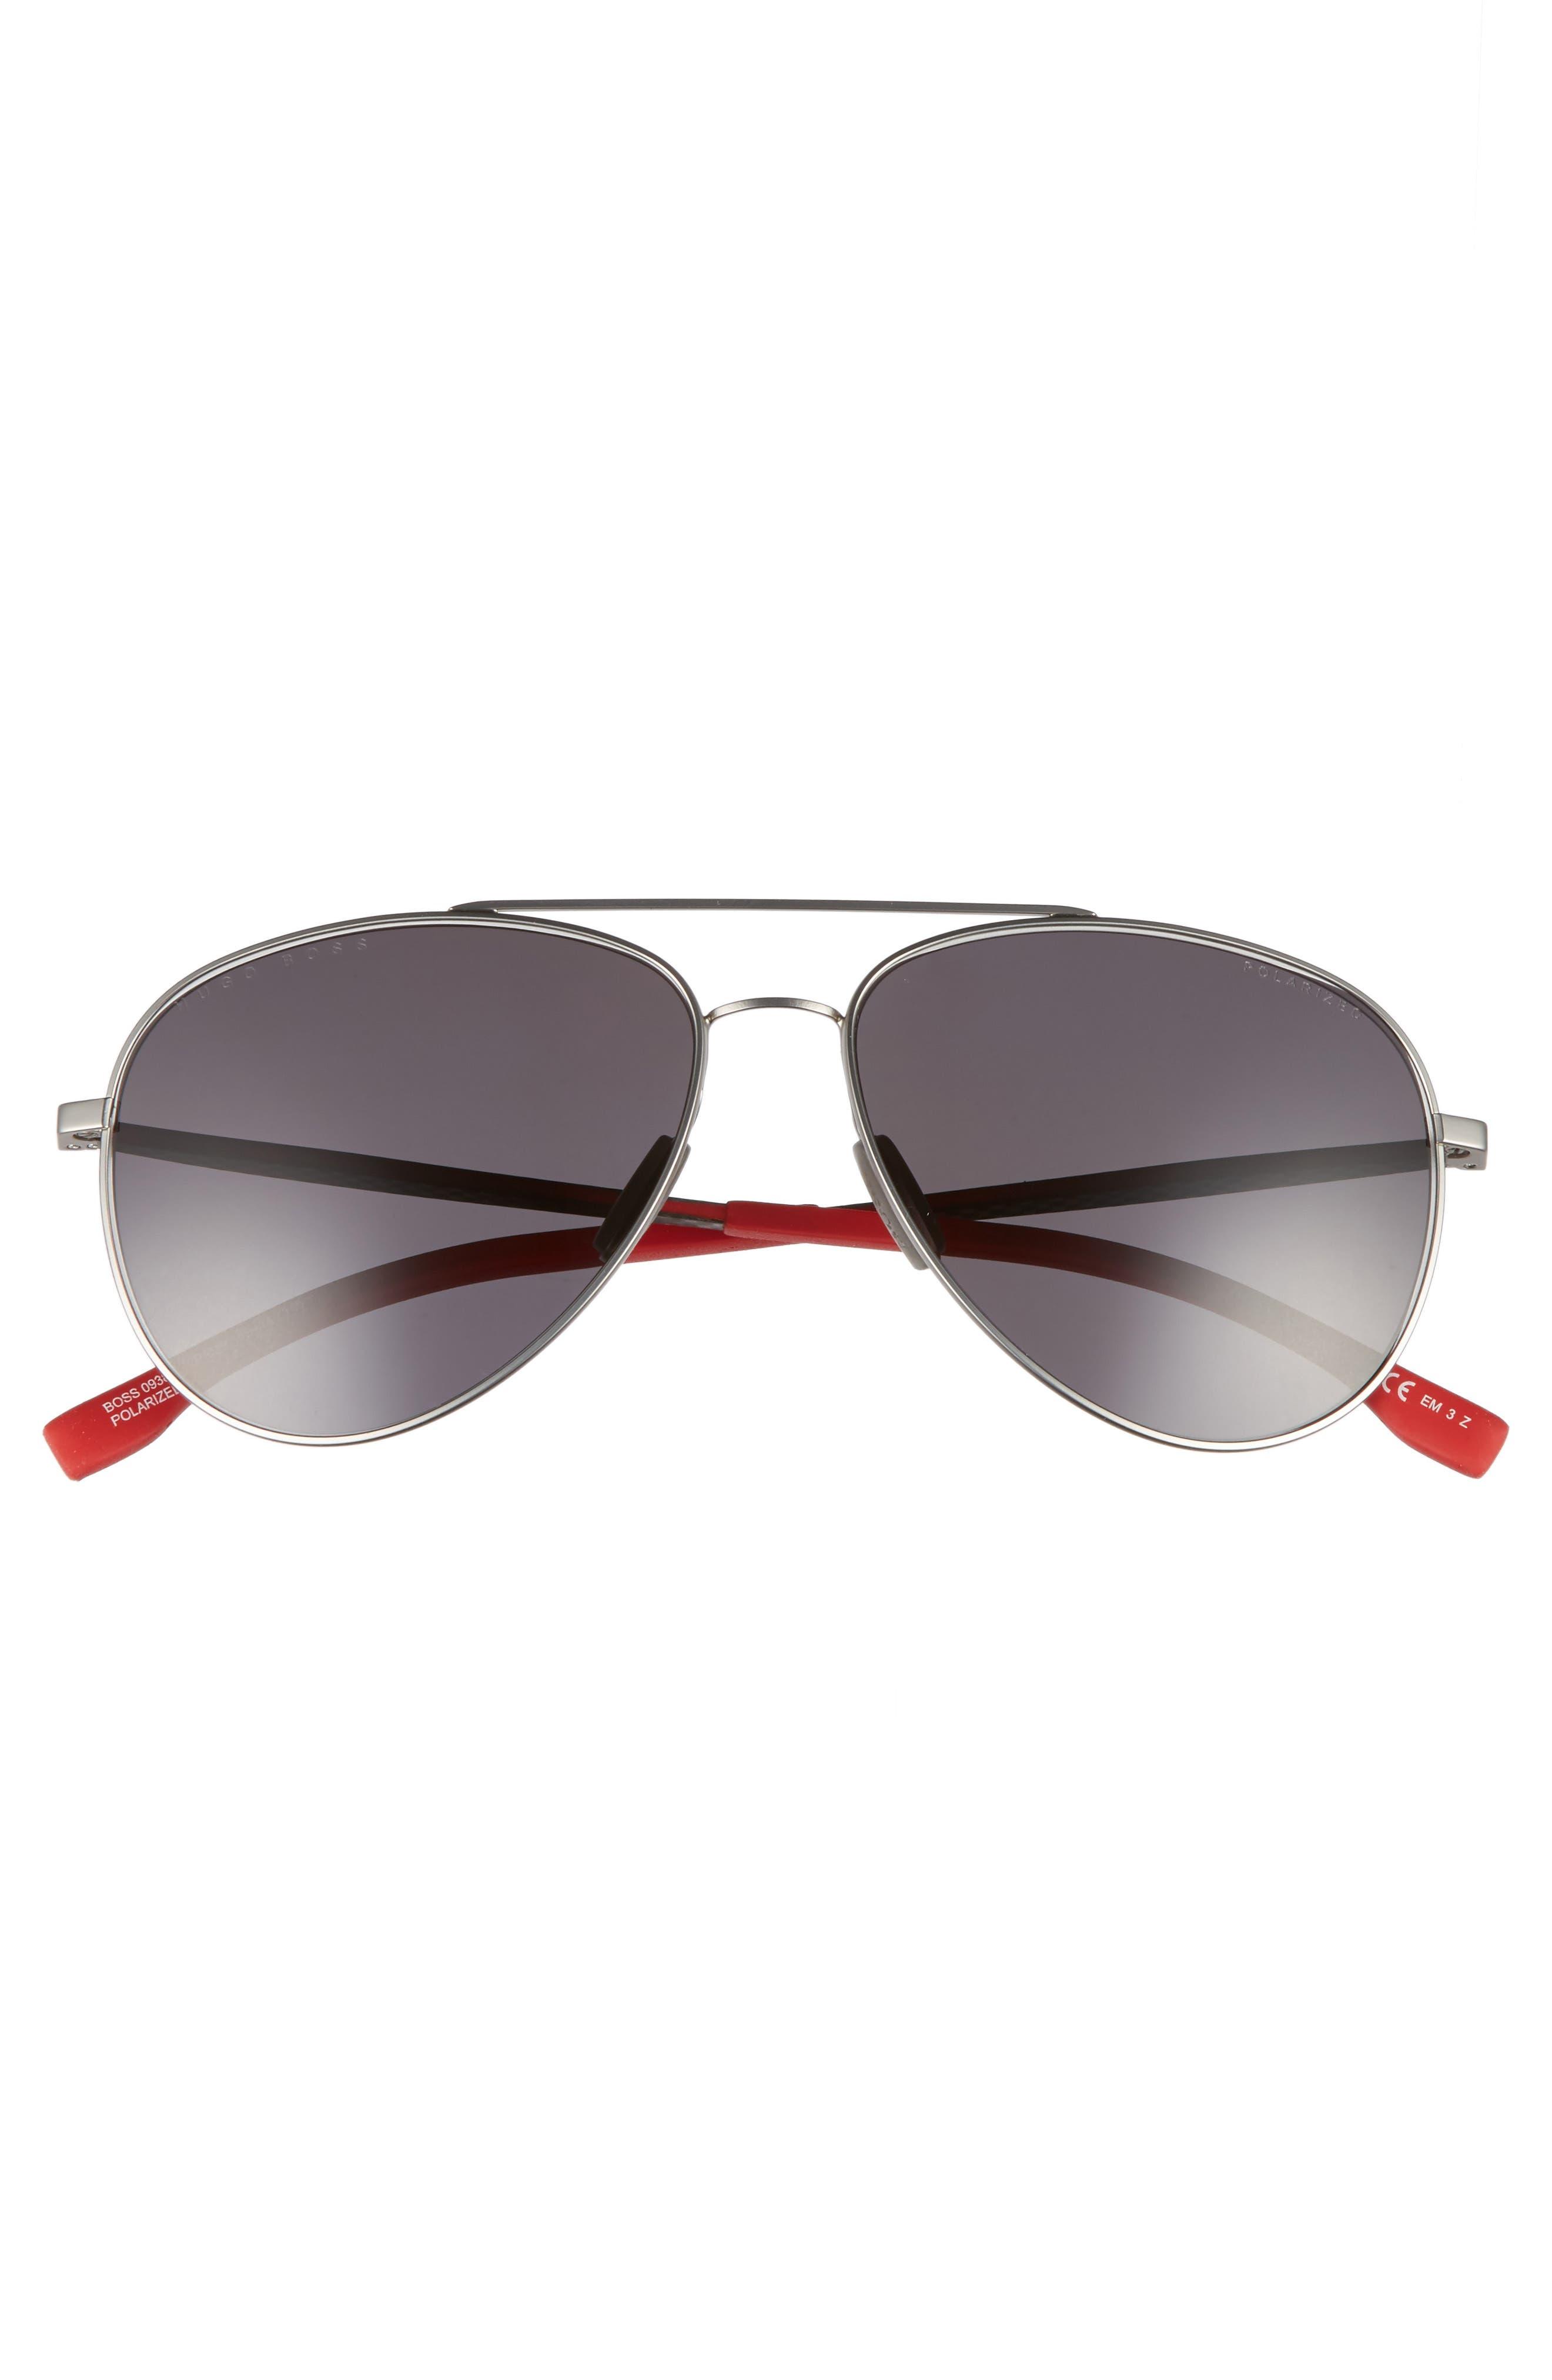 59mm Aviator Sunglasses,                             Alternate thumbnail 2, color,                             GREY RUBBER/ GREY